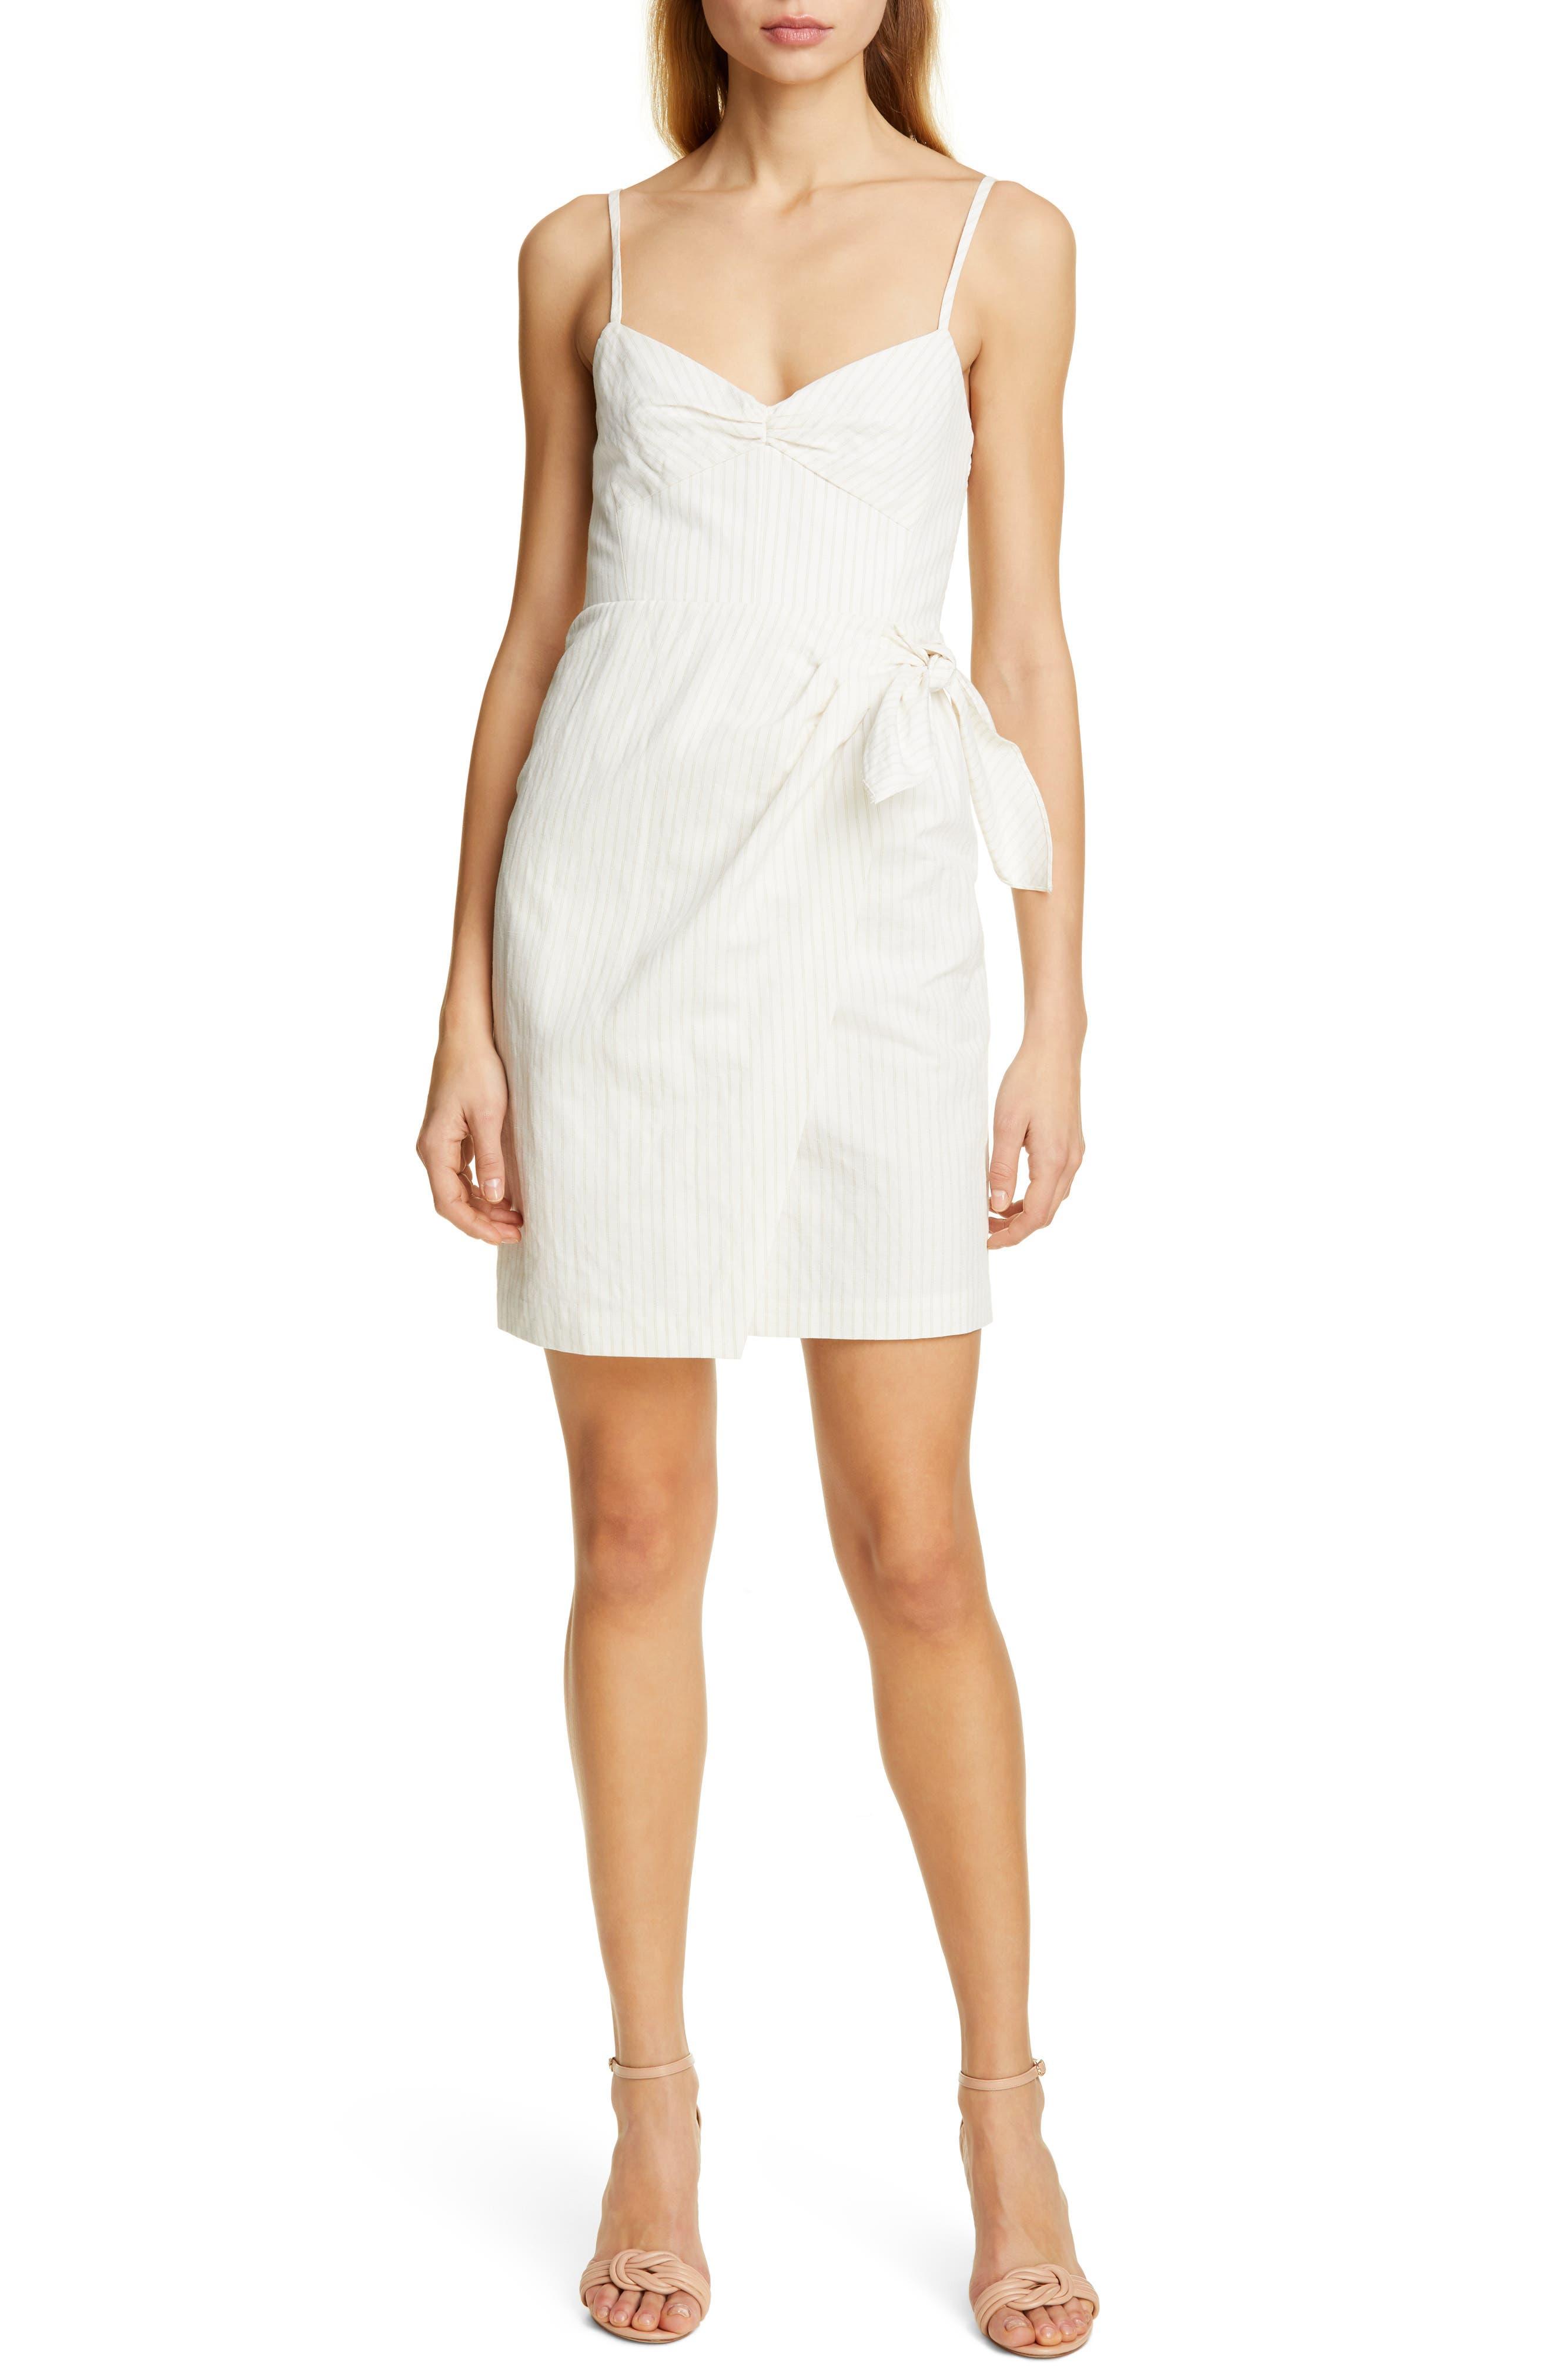 REBECCA TAYLOR, Pinstripe Cotton & Linen Dress, Main thumbnail 1, color, SNOW COMBO